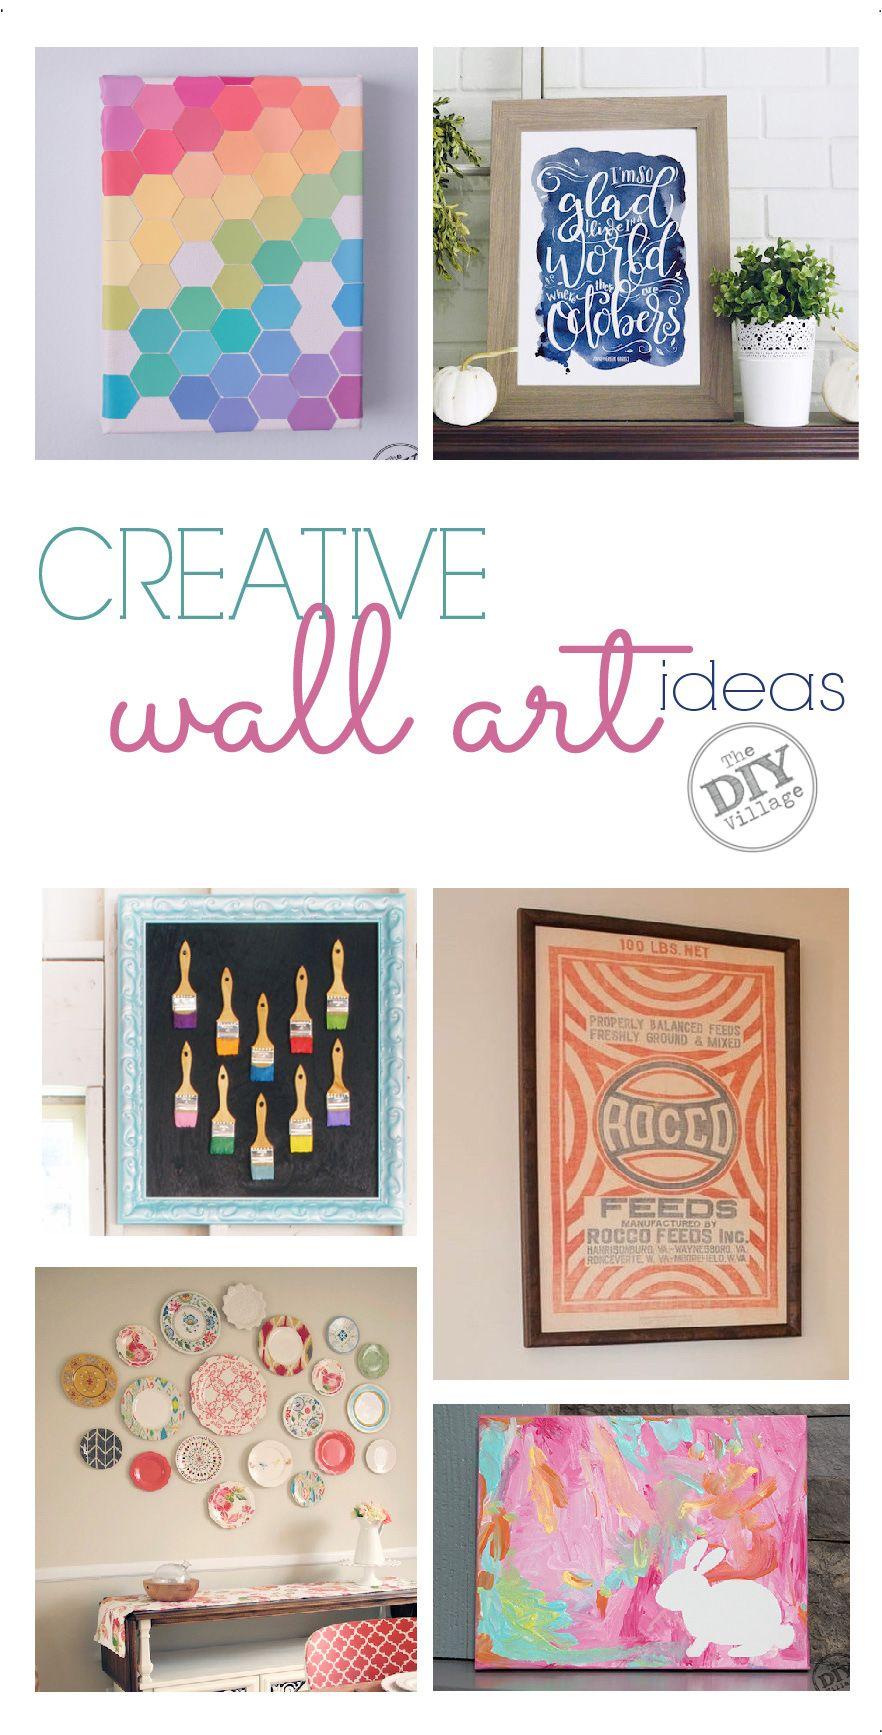 Creative wall art ideas diy pinterest creative